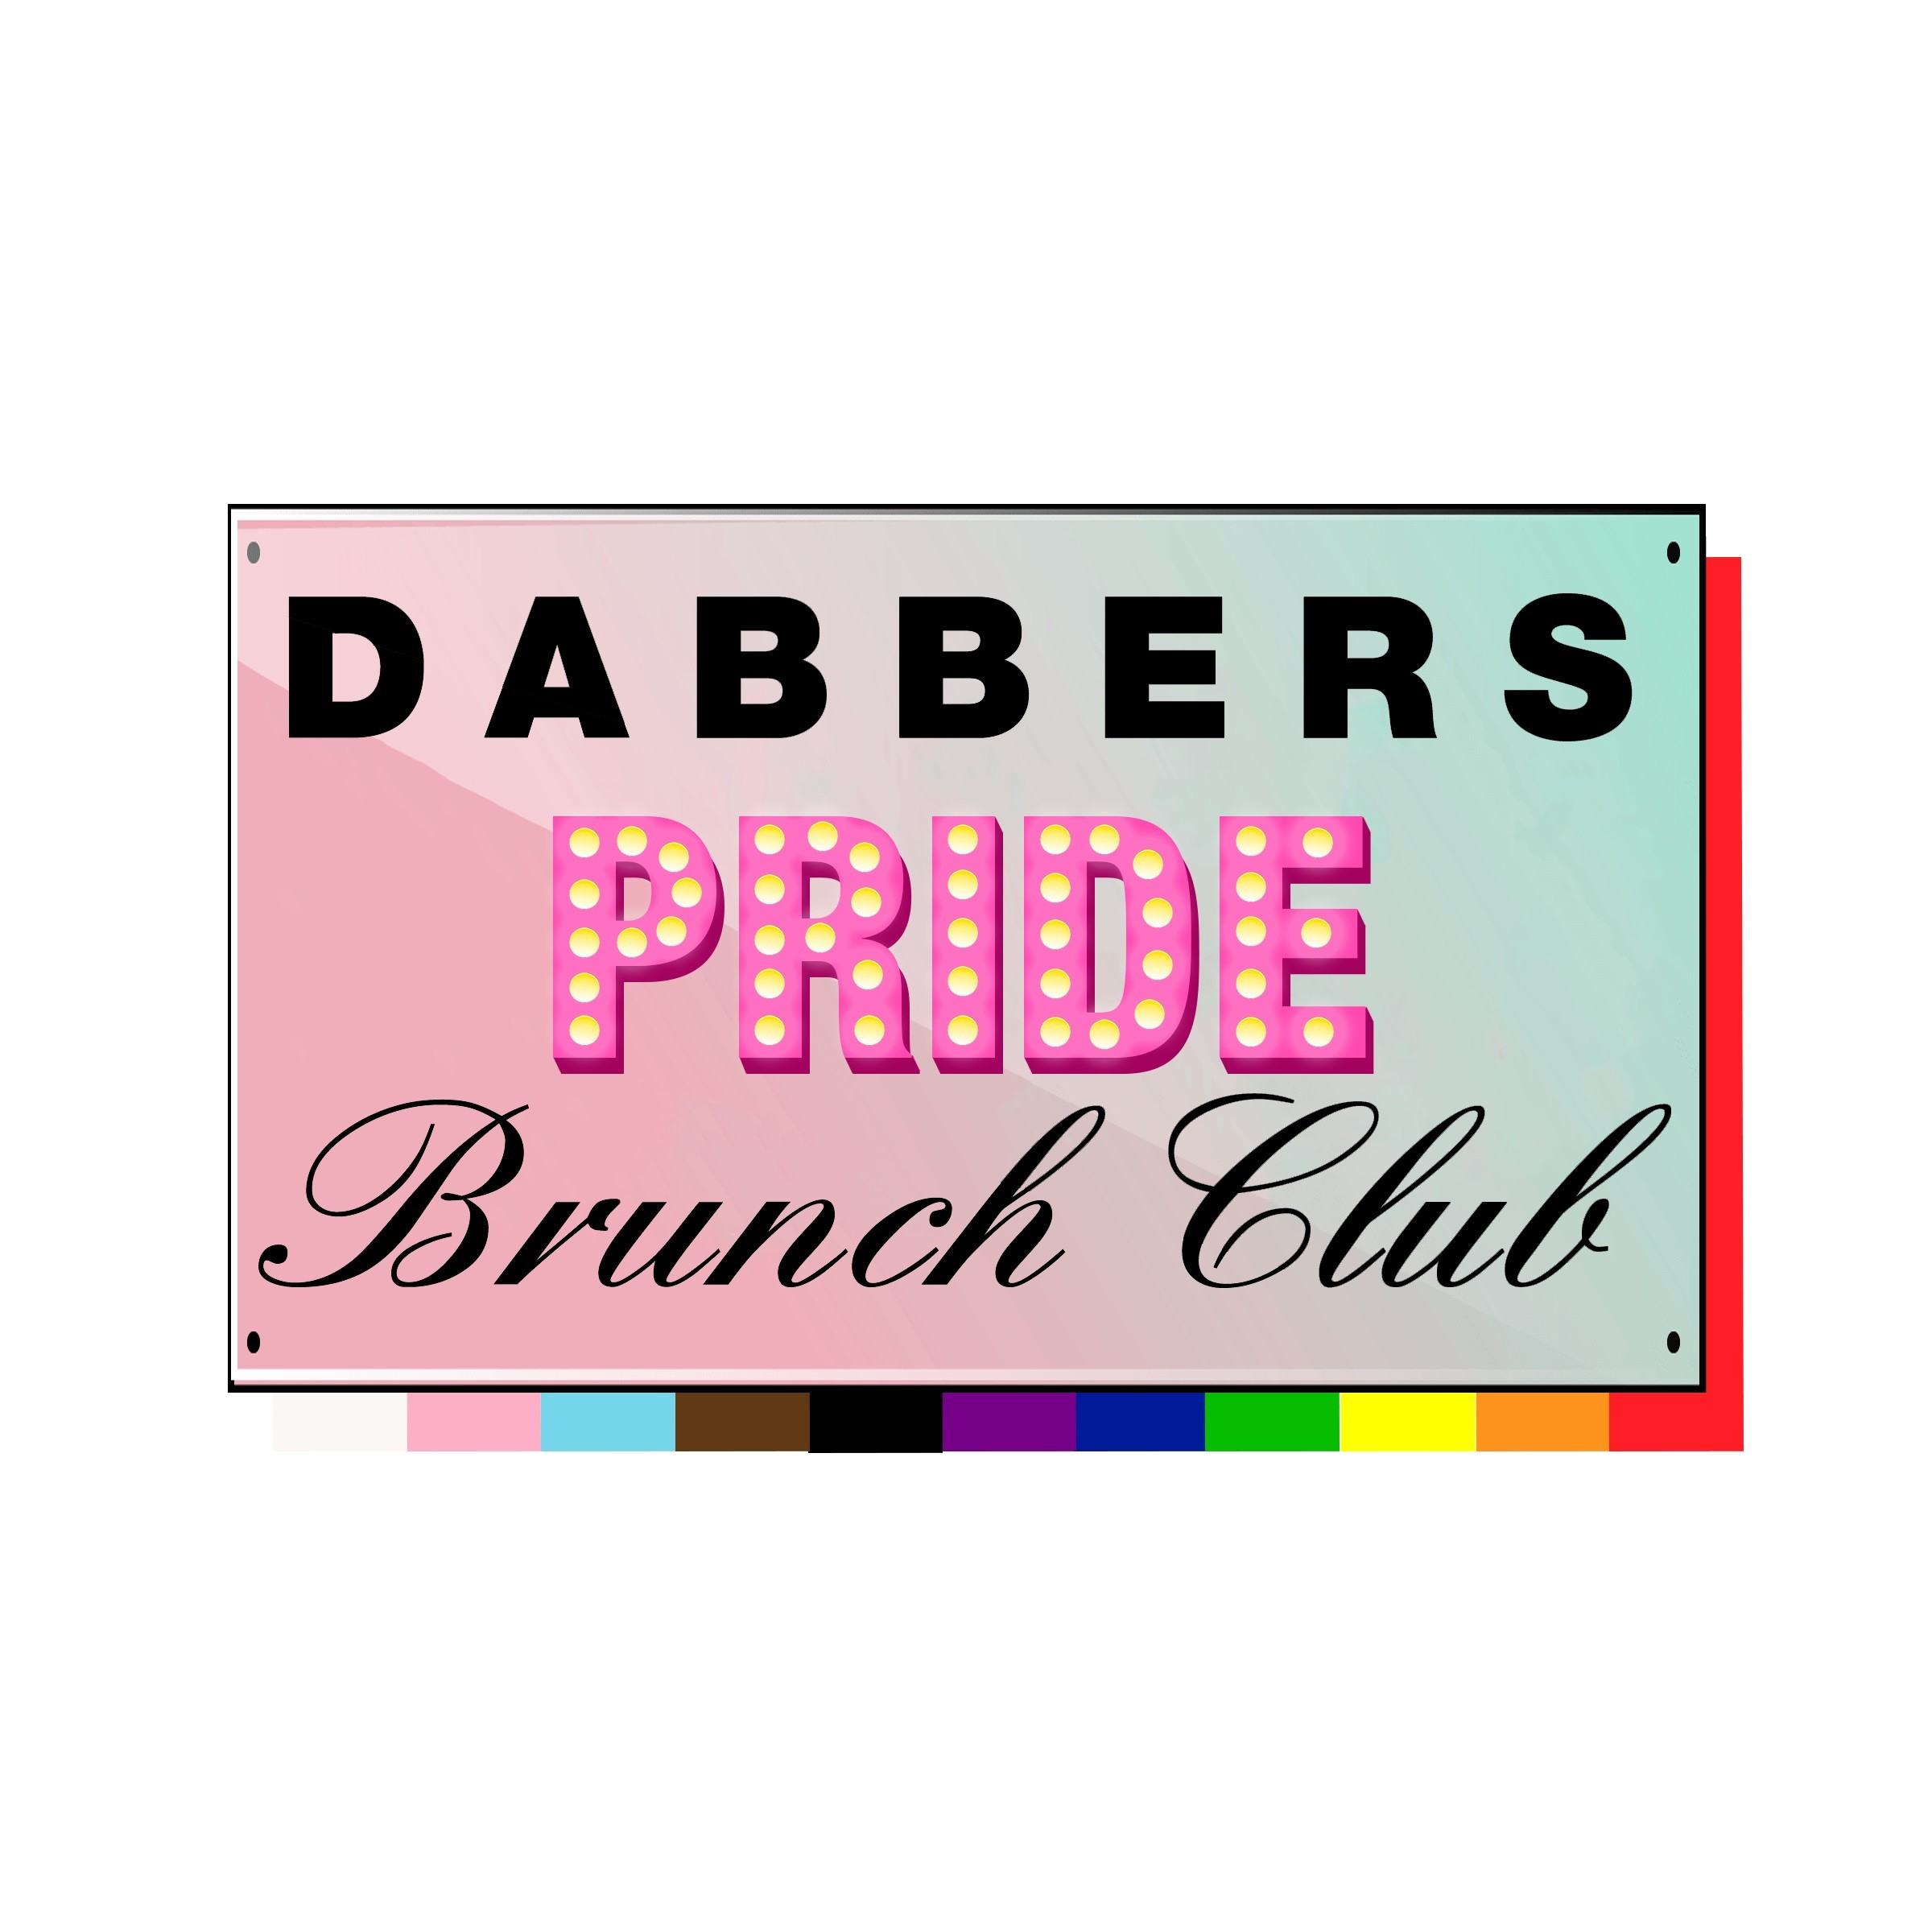 Dabbers Pride Brunch Club